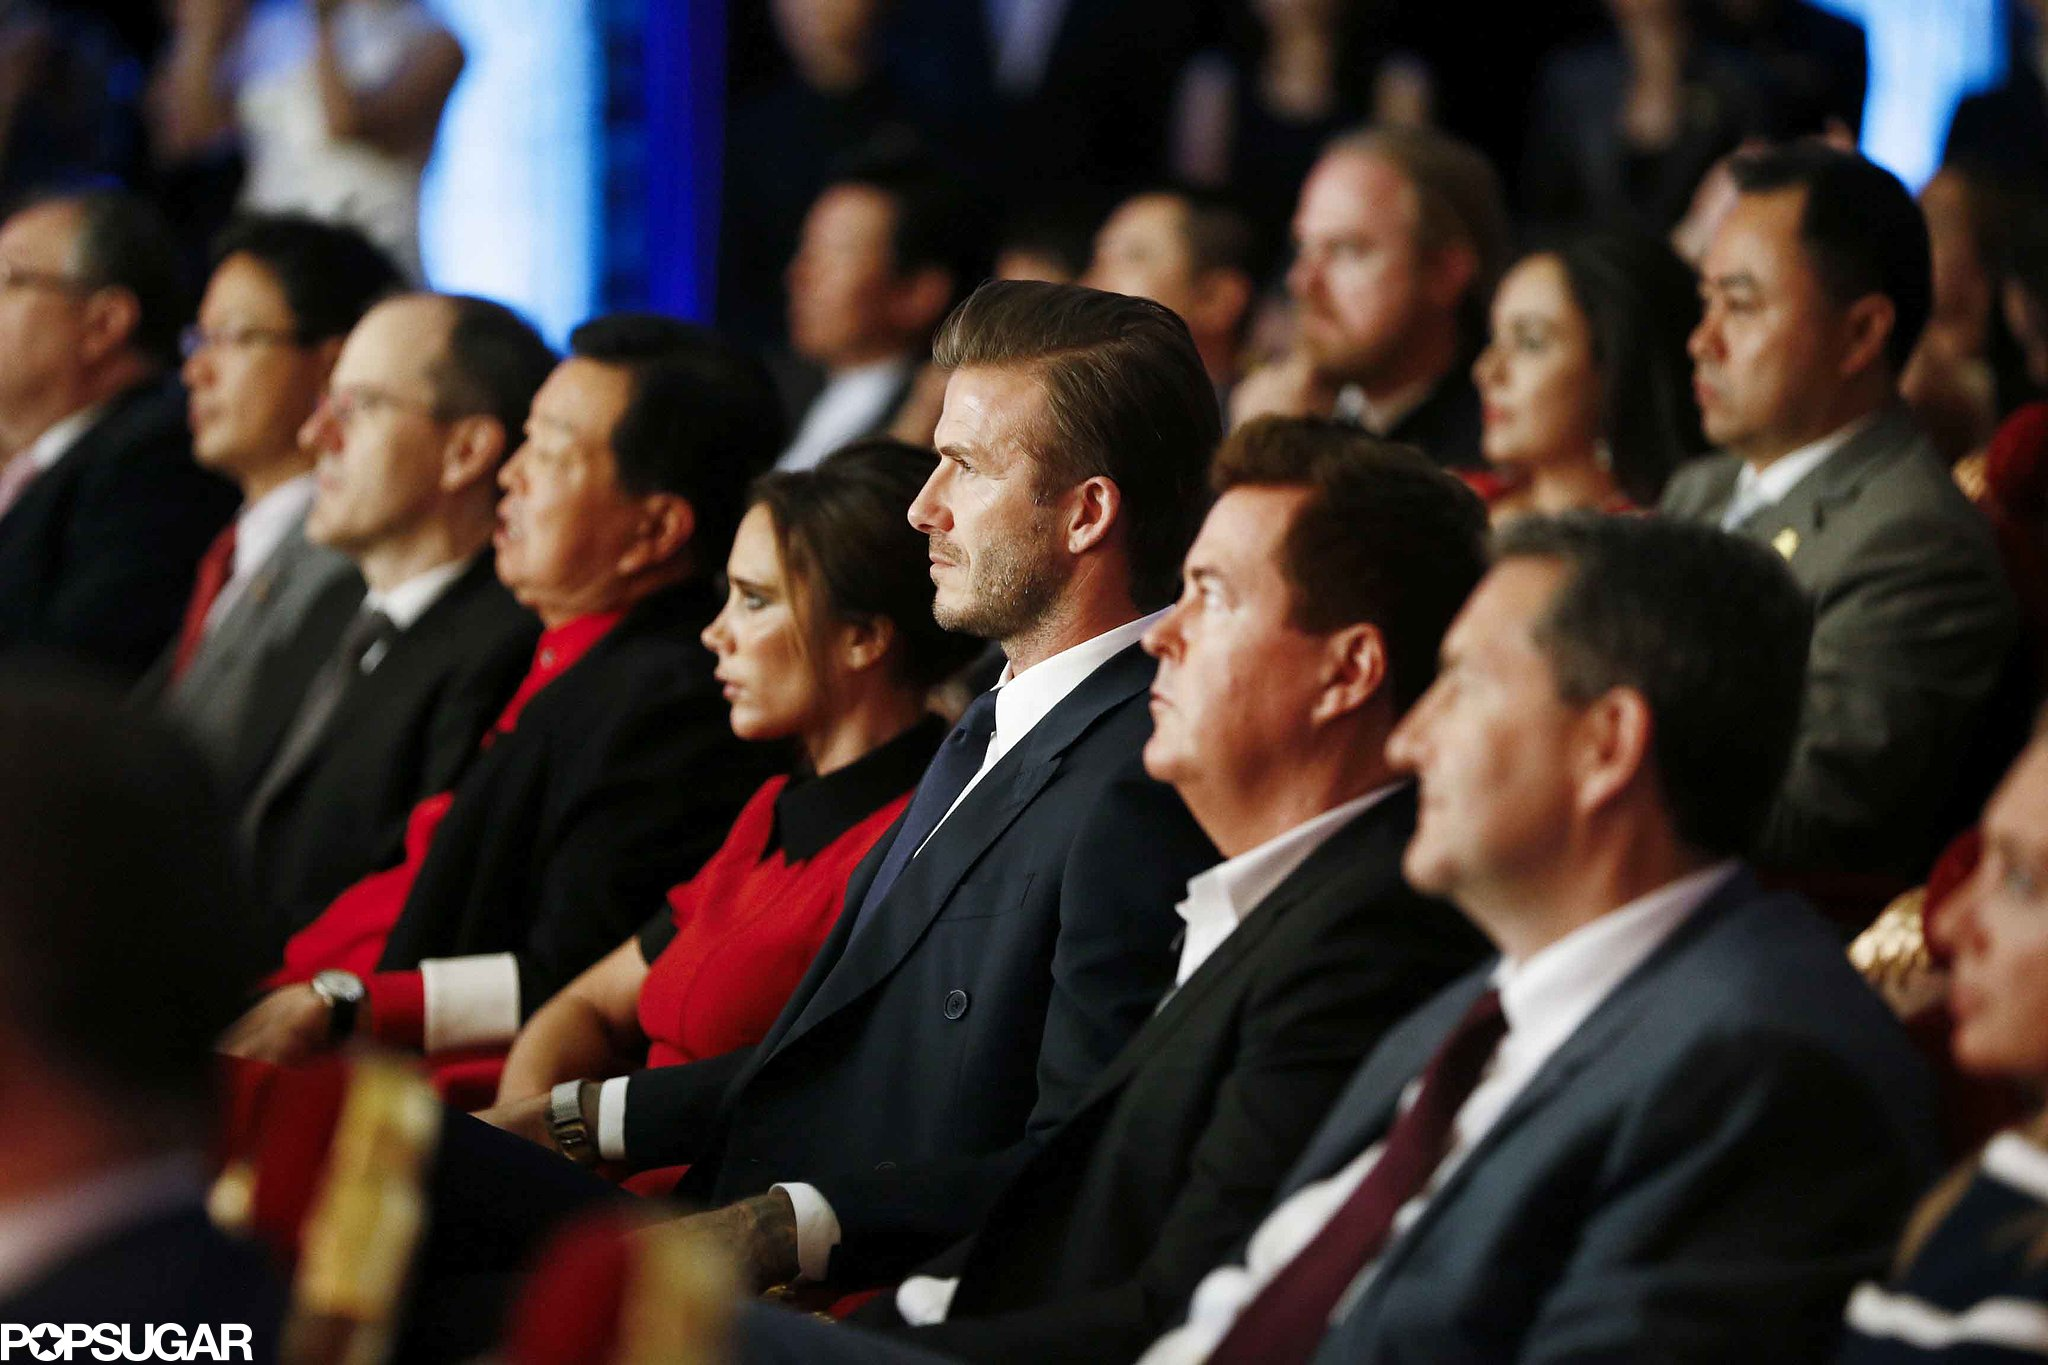 David Beckham put his hand on Victoria Beckham's lap while they watched the Peking Opera. Source: Tungstar/Splash News Online